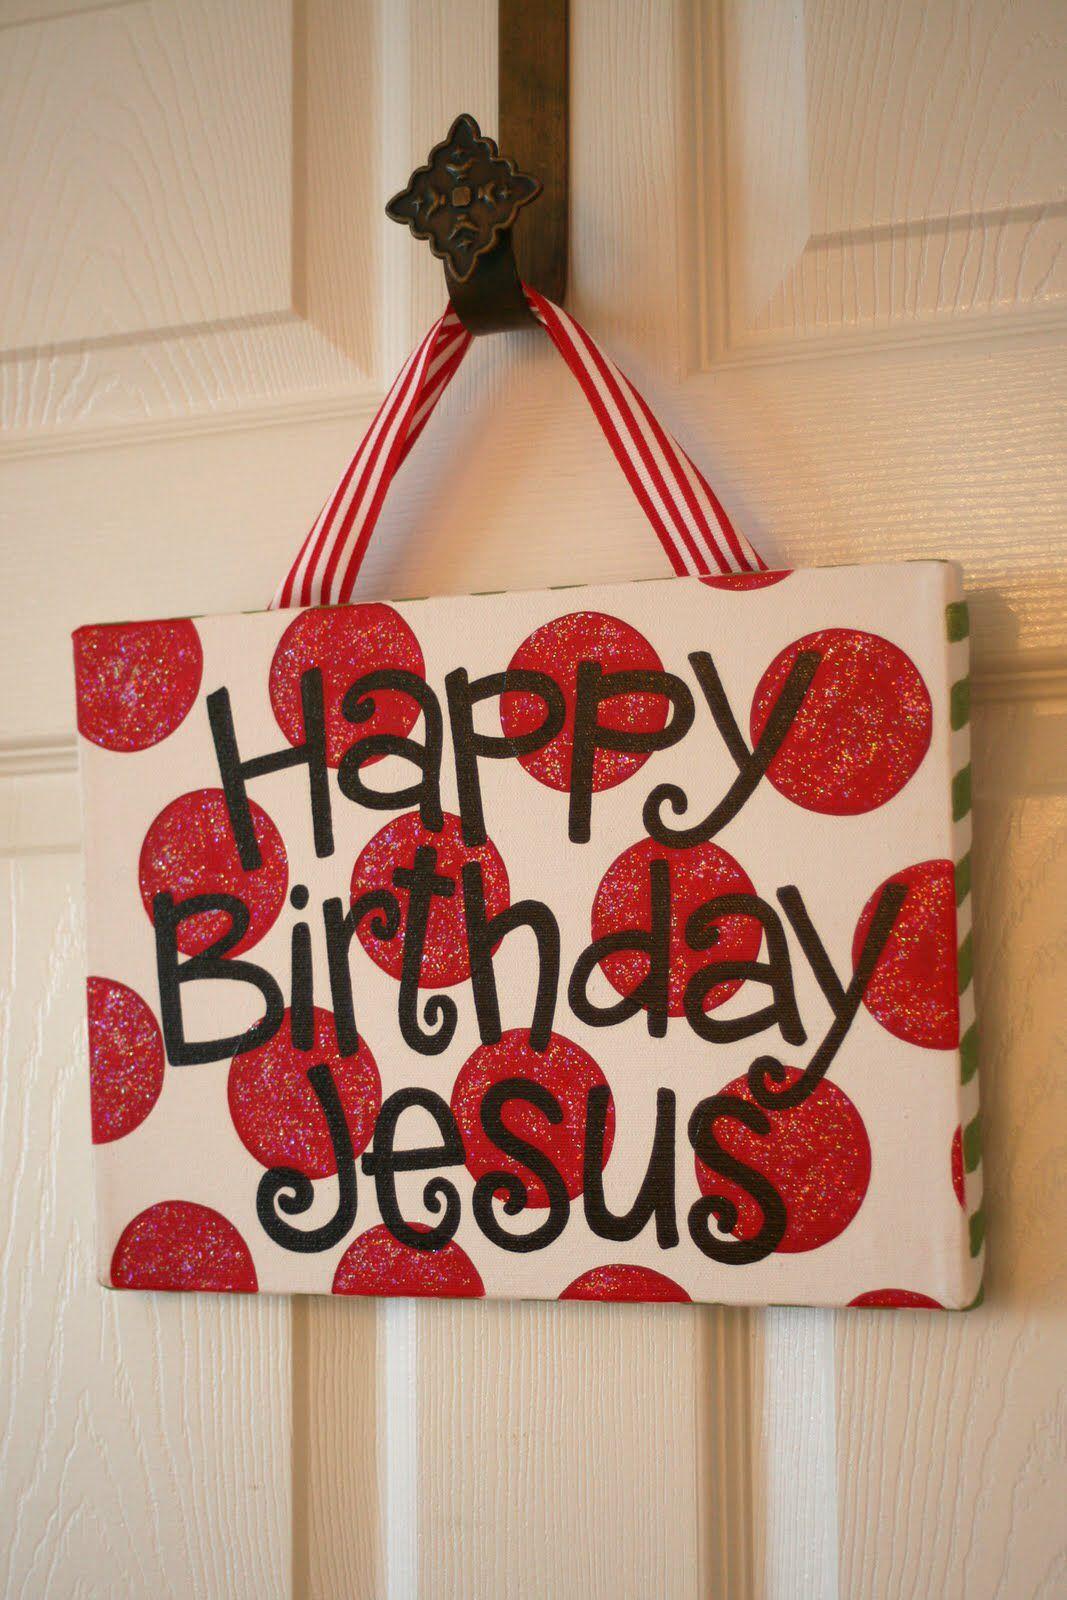 Happy birthday Jesus Christmas canvas, Happy birthday